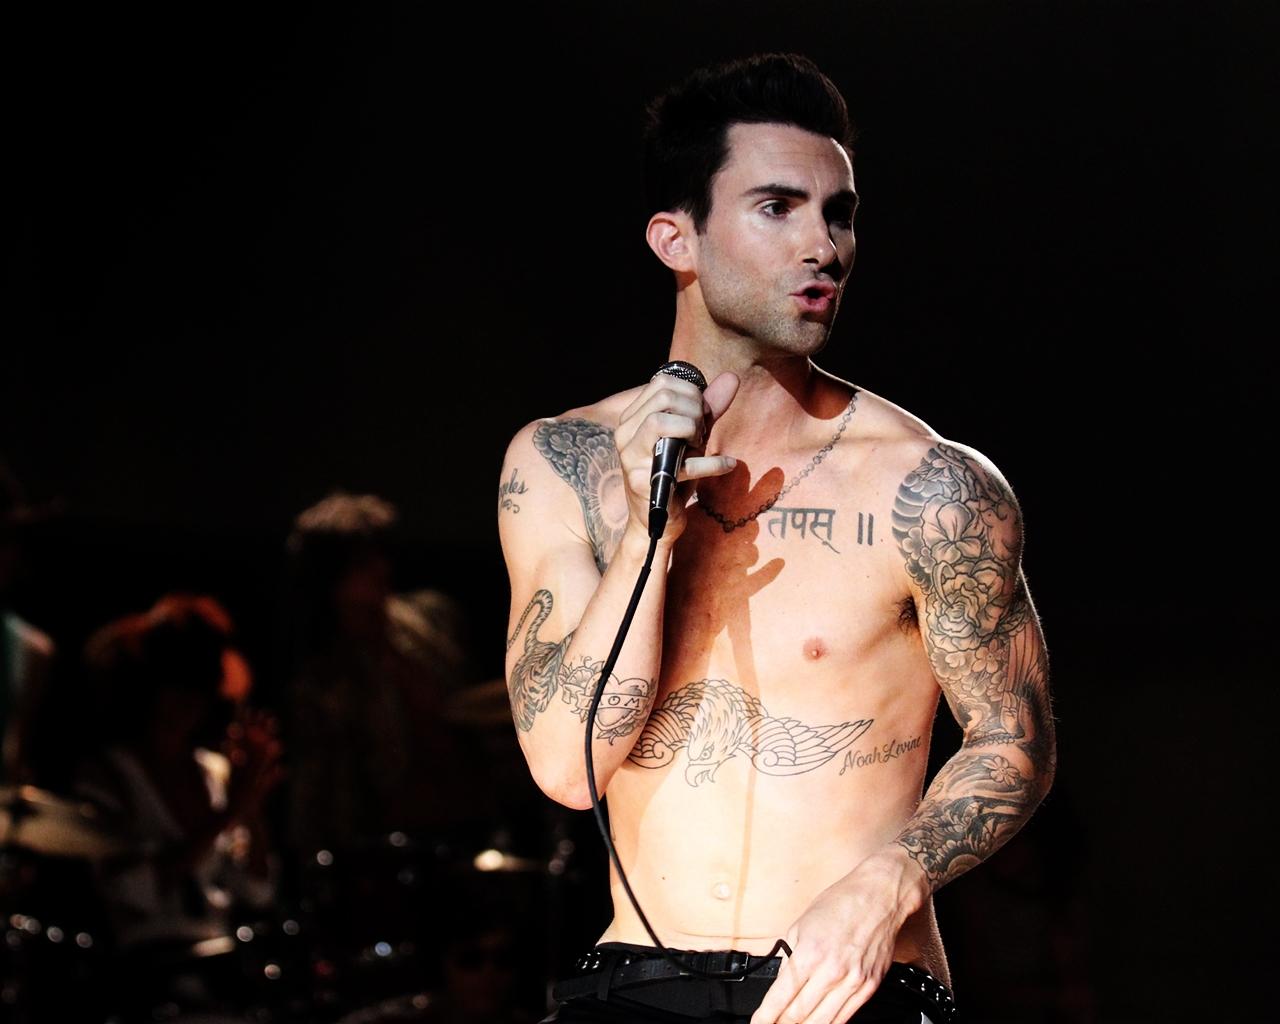 Adam Levine Boy Hairstyle Stylist Top Hd Adam Levine Wallpaper Men Hd Adam Levine Wallpapers Wallpaper 1280x1024